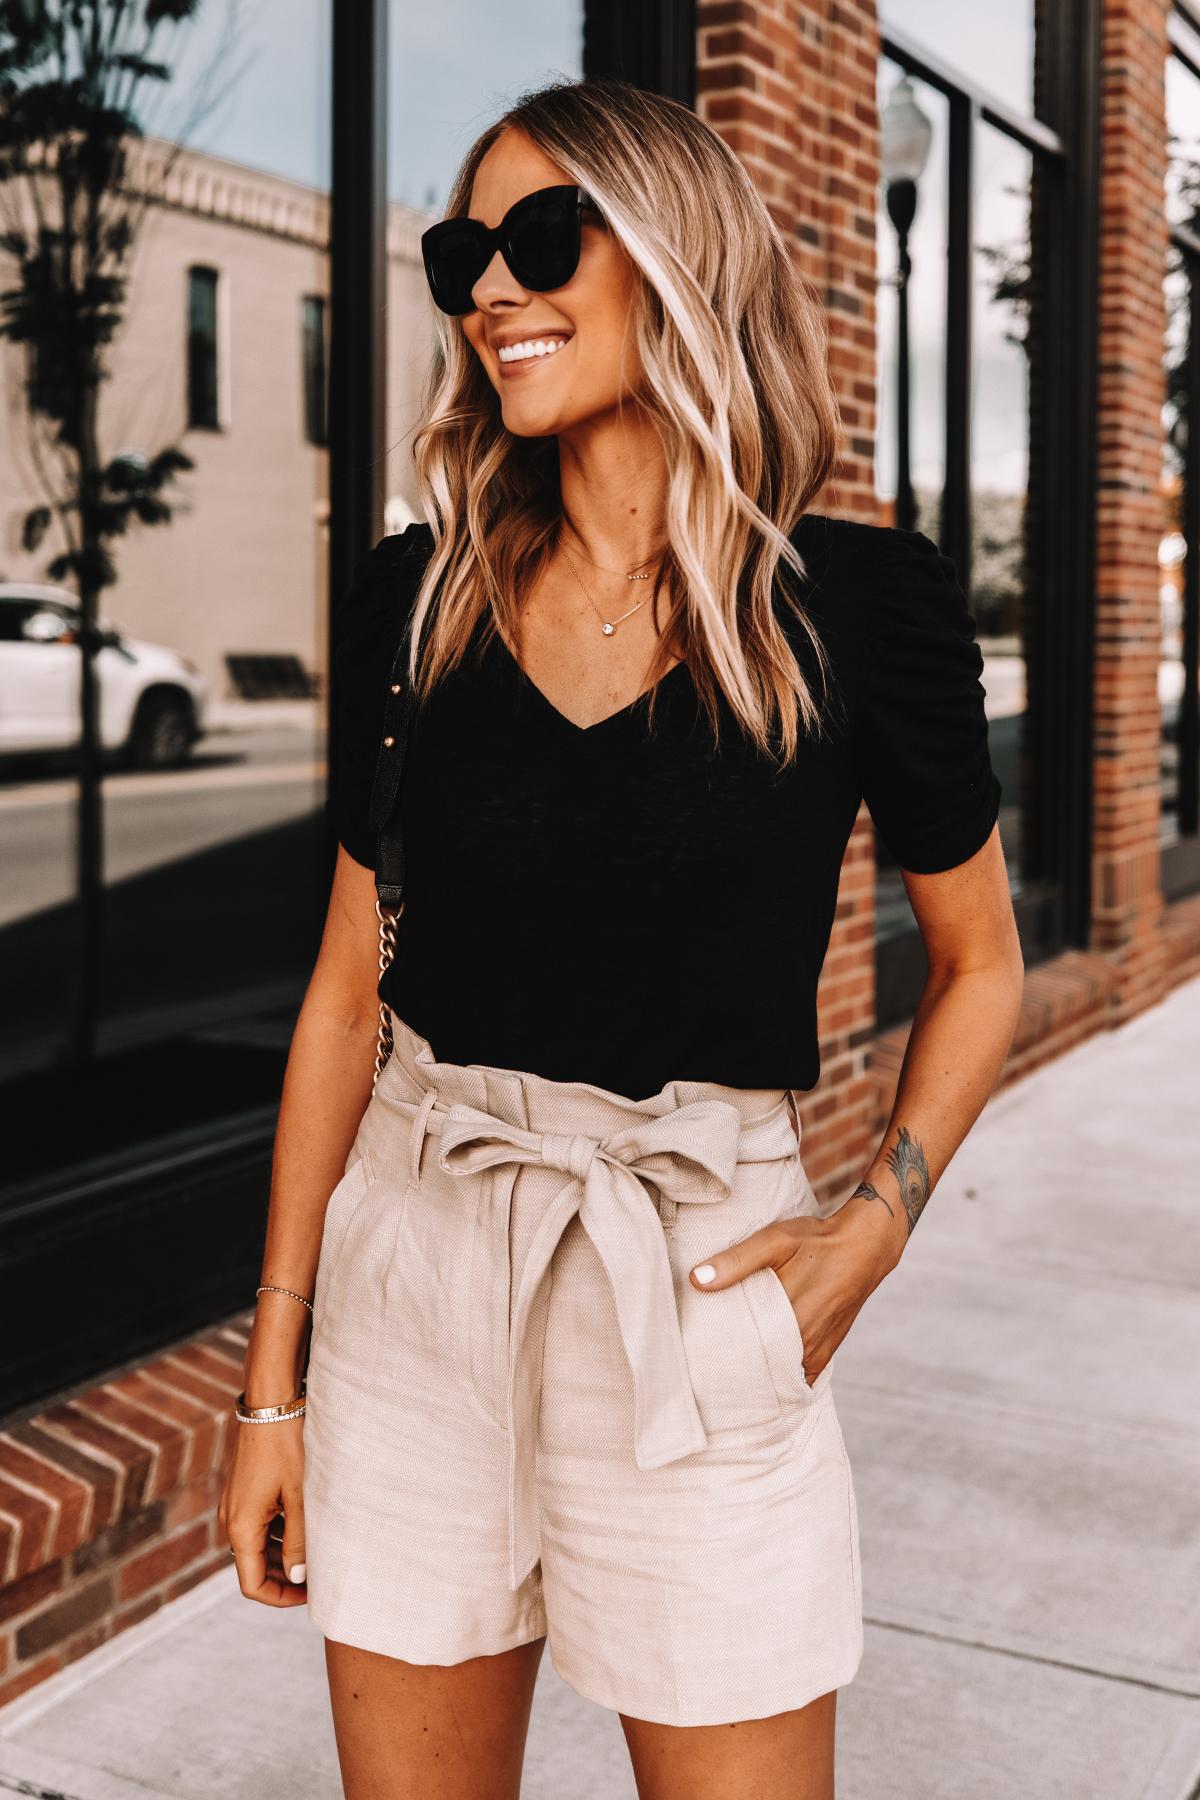 Fashion Jackson Wearing Express Black Vneck T-Shirt Tan Paperbag Waist Shorts Summer Outfit